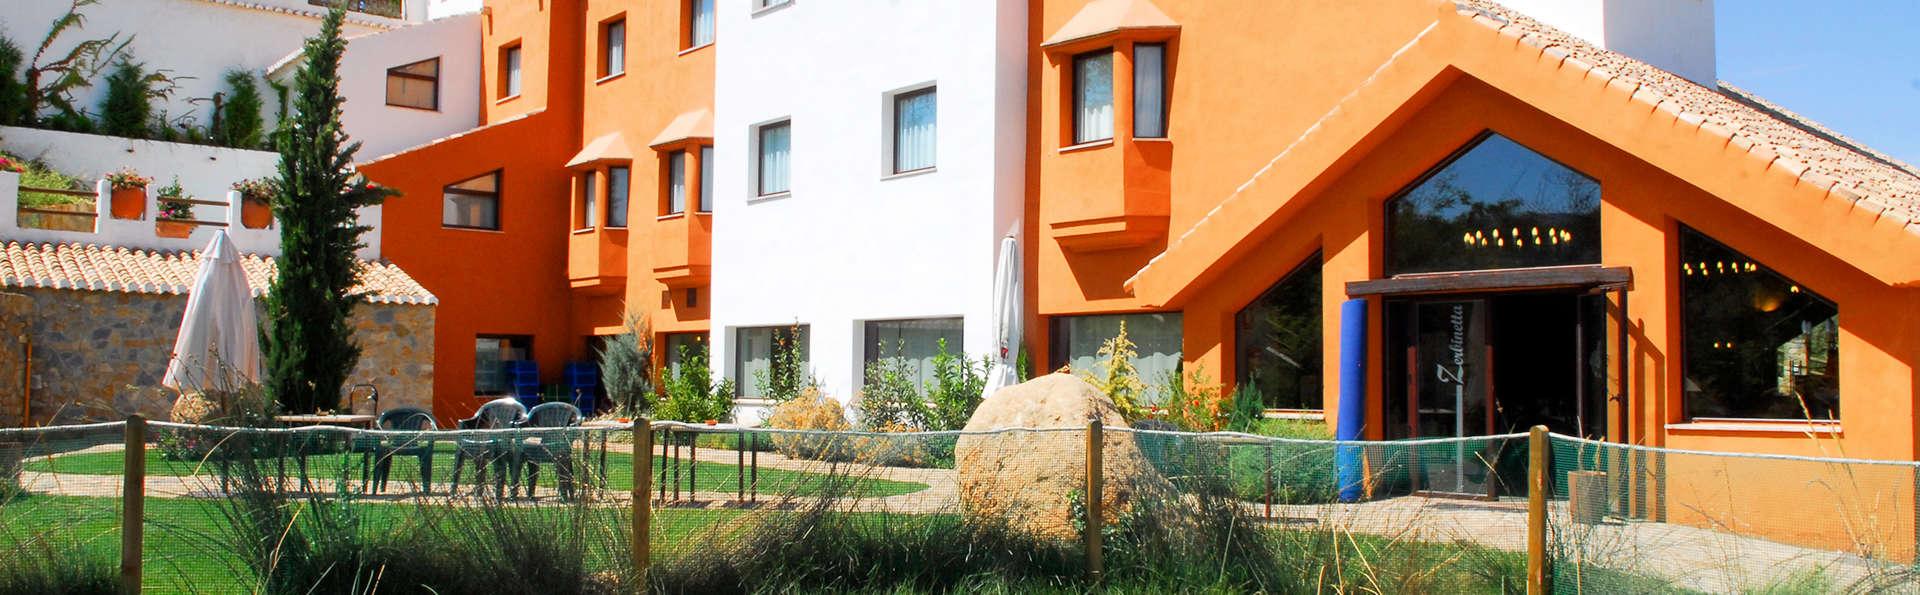 Hotel Zerbinetta - EDIT_1_FACHADA.jpg